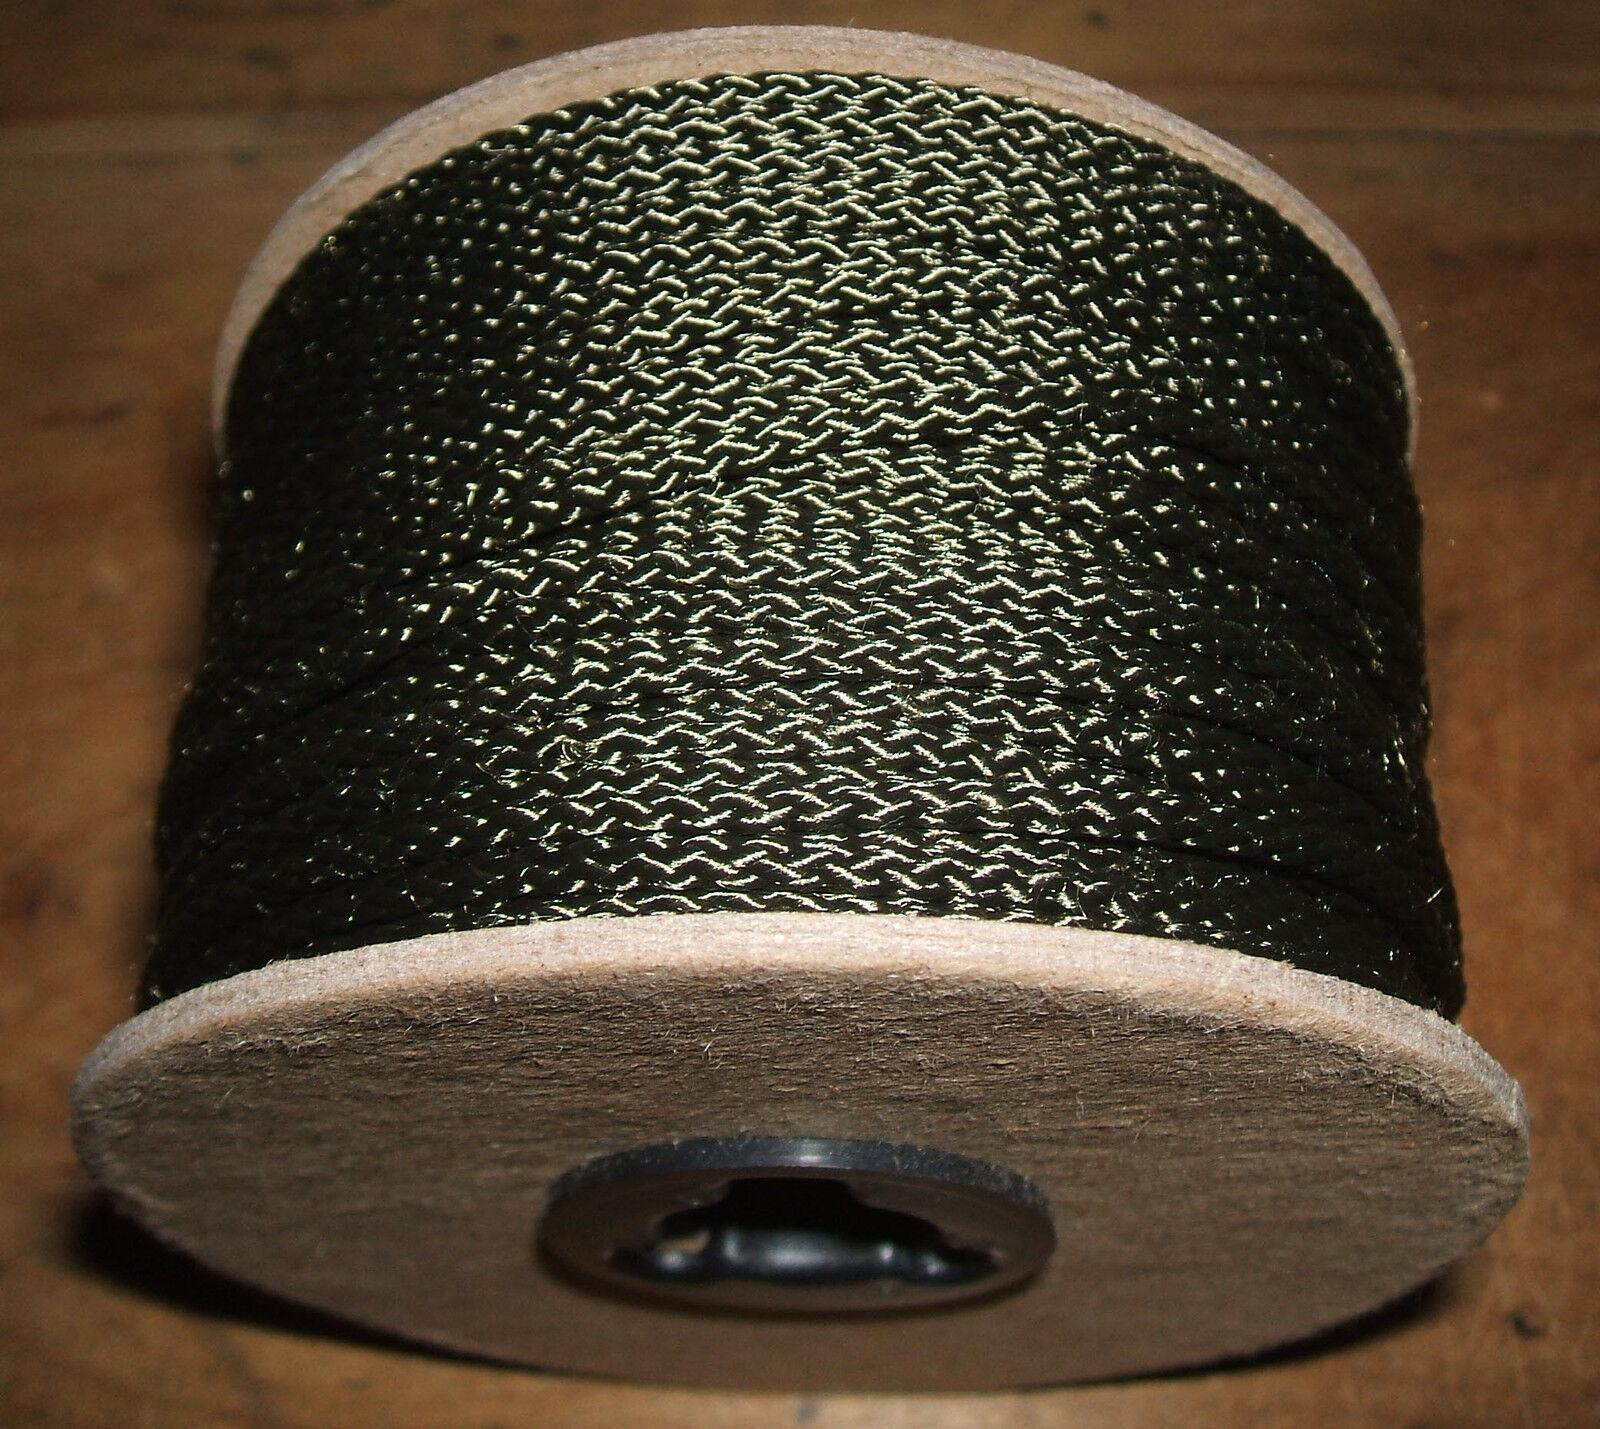 3 32  x 500' Diamond Braid Olive Drab Polyester   Dacron Cord - Twine - String